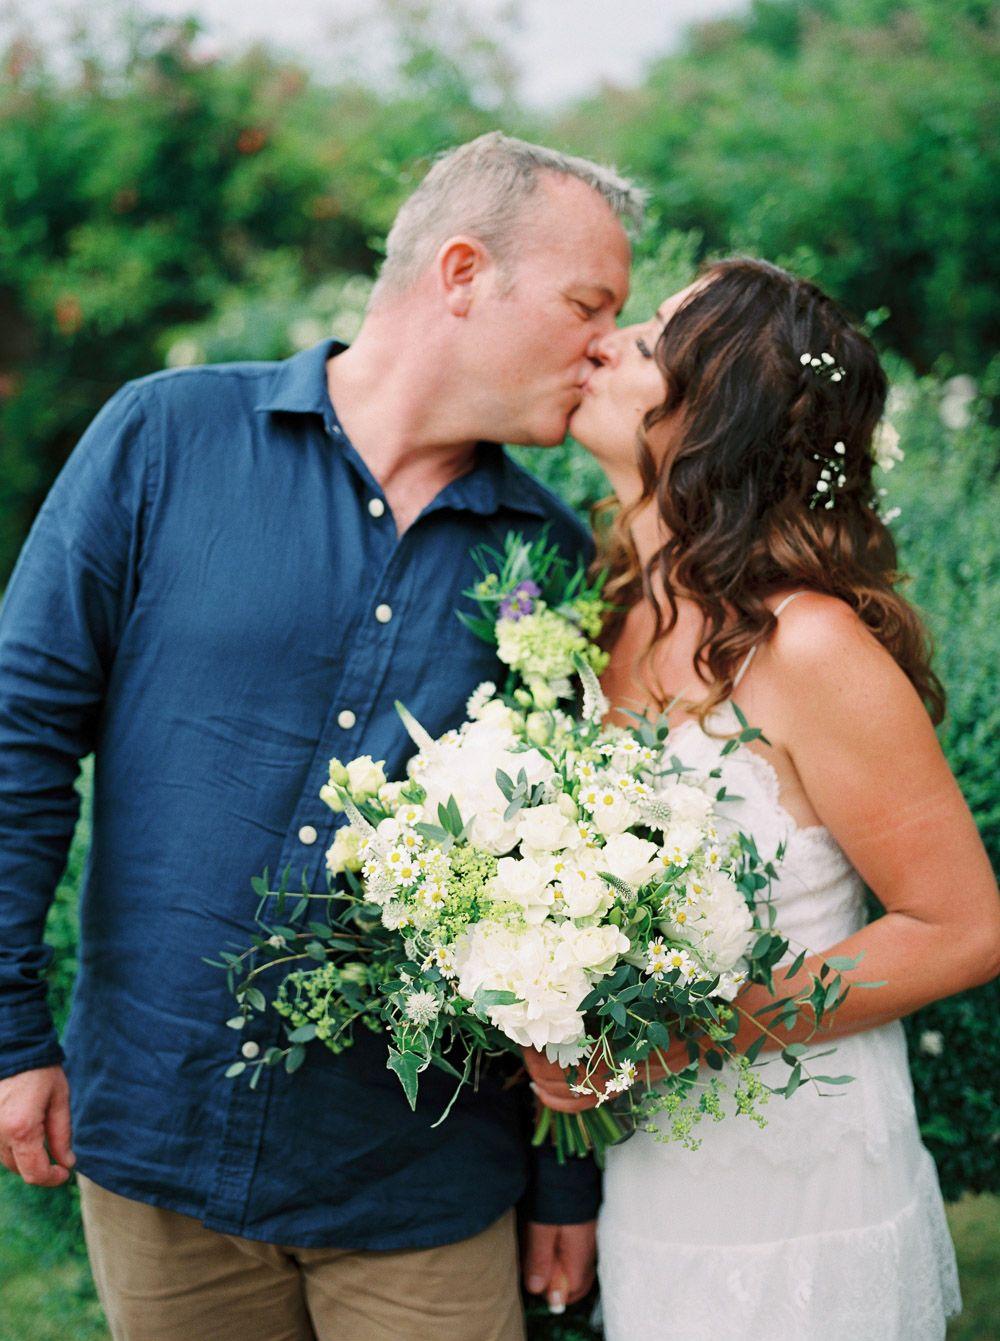 Honeybrook Farm Wedding Venue In Wiltshire With Free People Dress